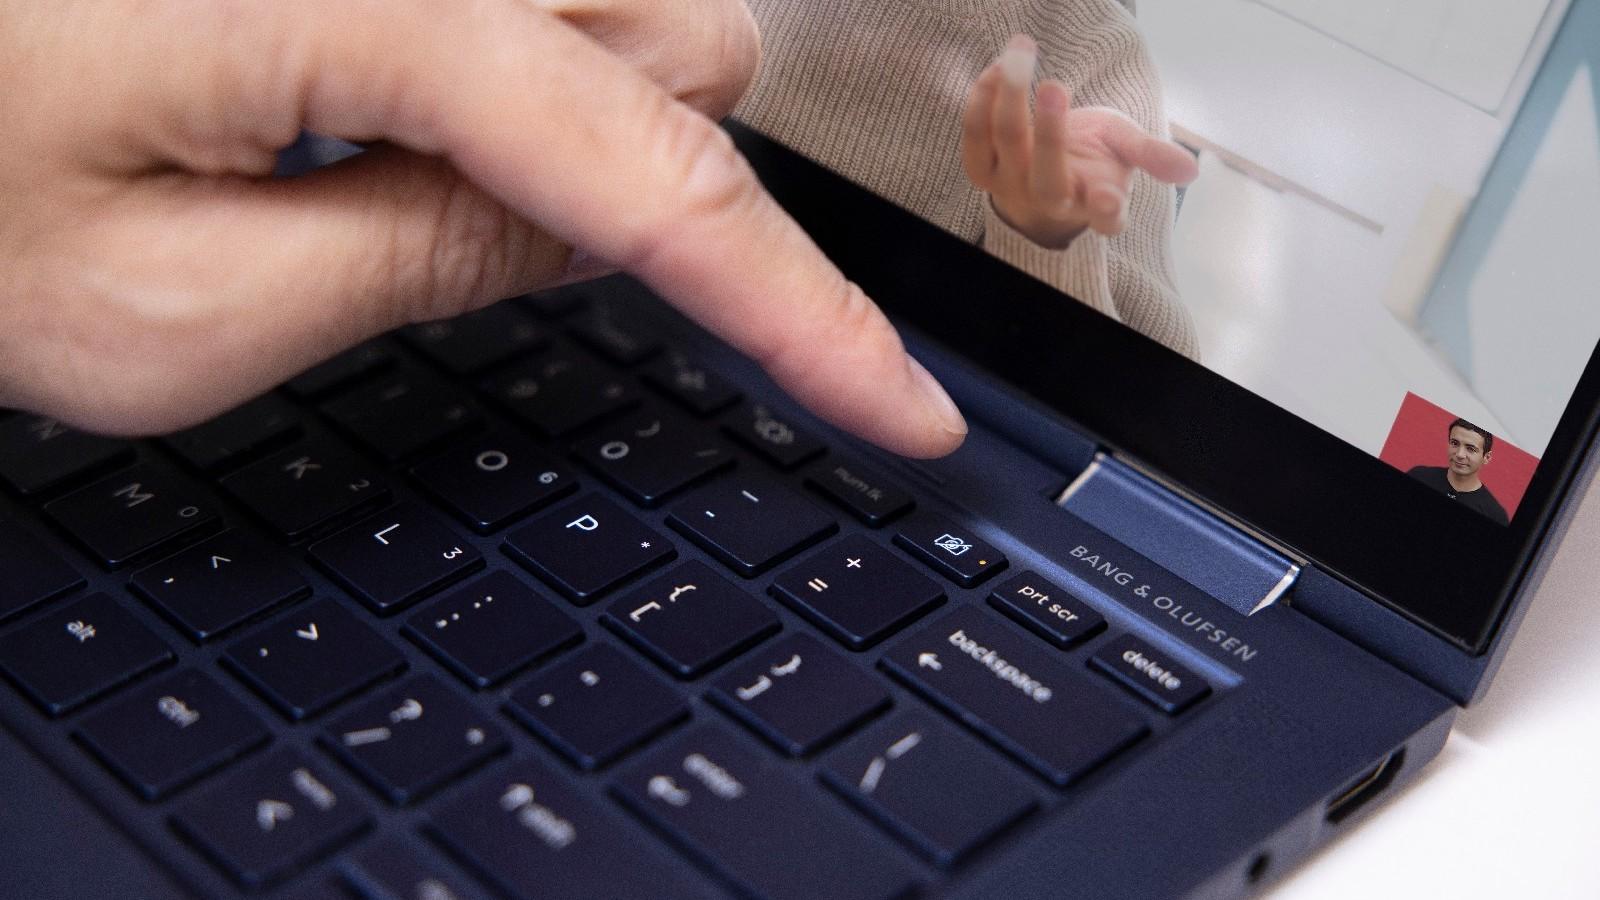 HP Elite Dragonfly G2 laptop weighs only under a kilogram